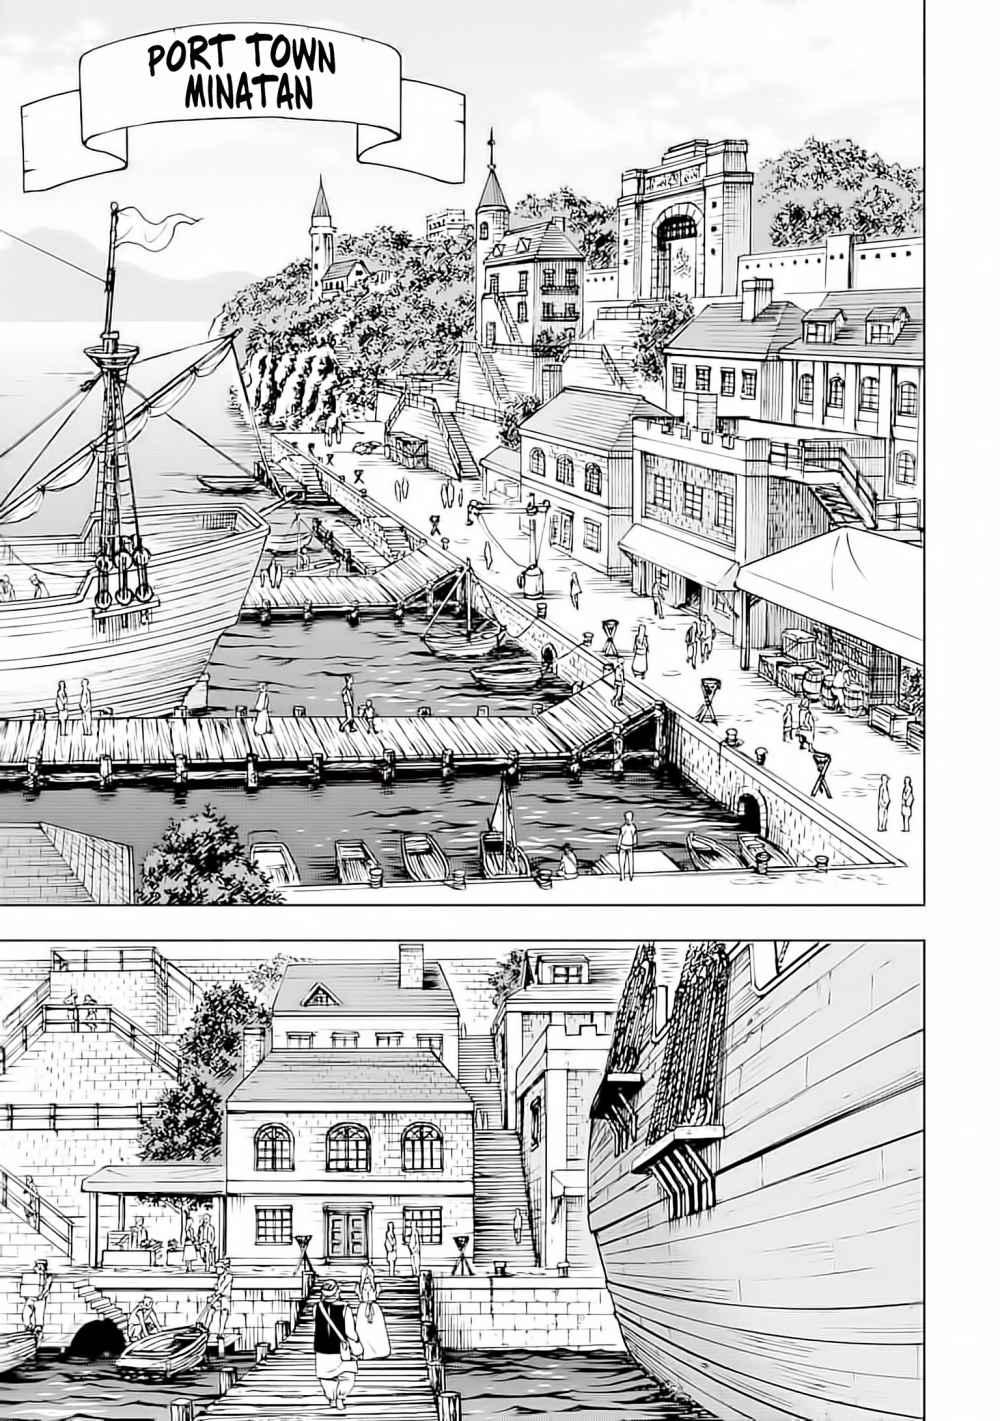 Isekai Kenja no Tensei Musou ~Geemu no Chishiki de Isekai Saikyou~ - chapter 4-eng-li